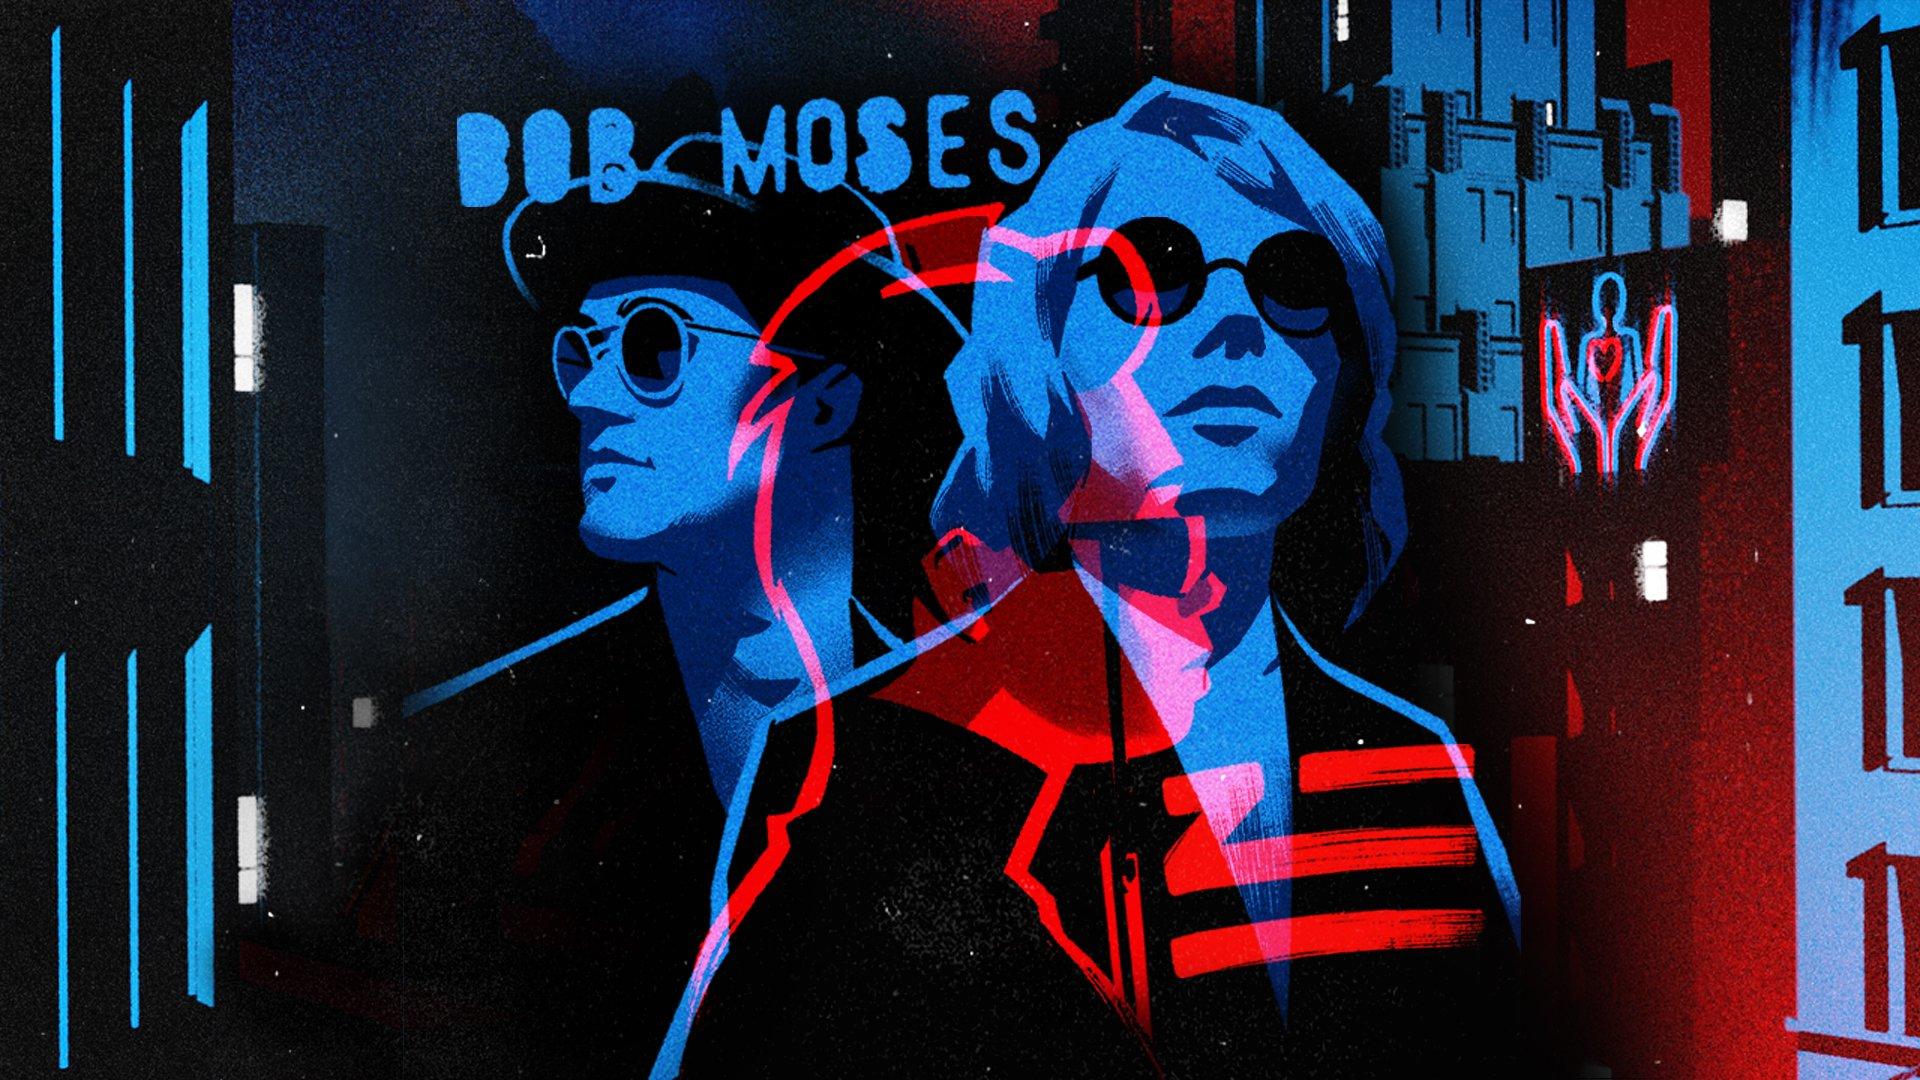 Thumbnail for Bob Moses + ZHU Interactive Music Video